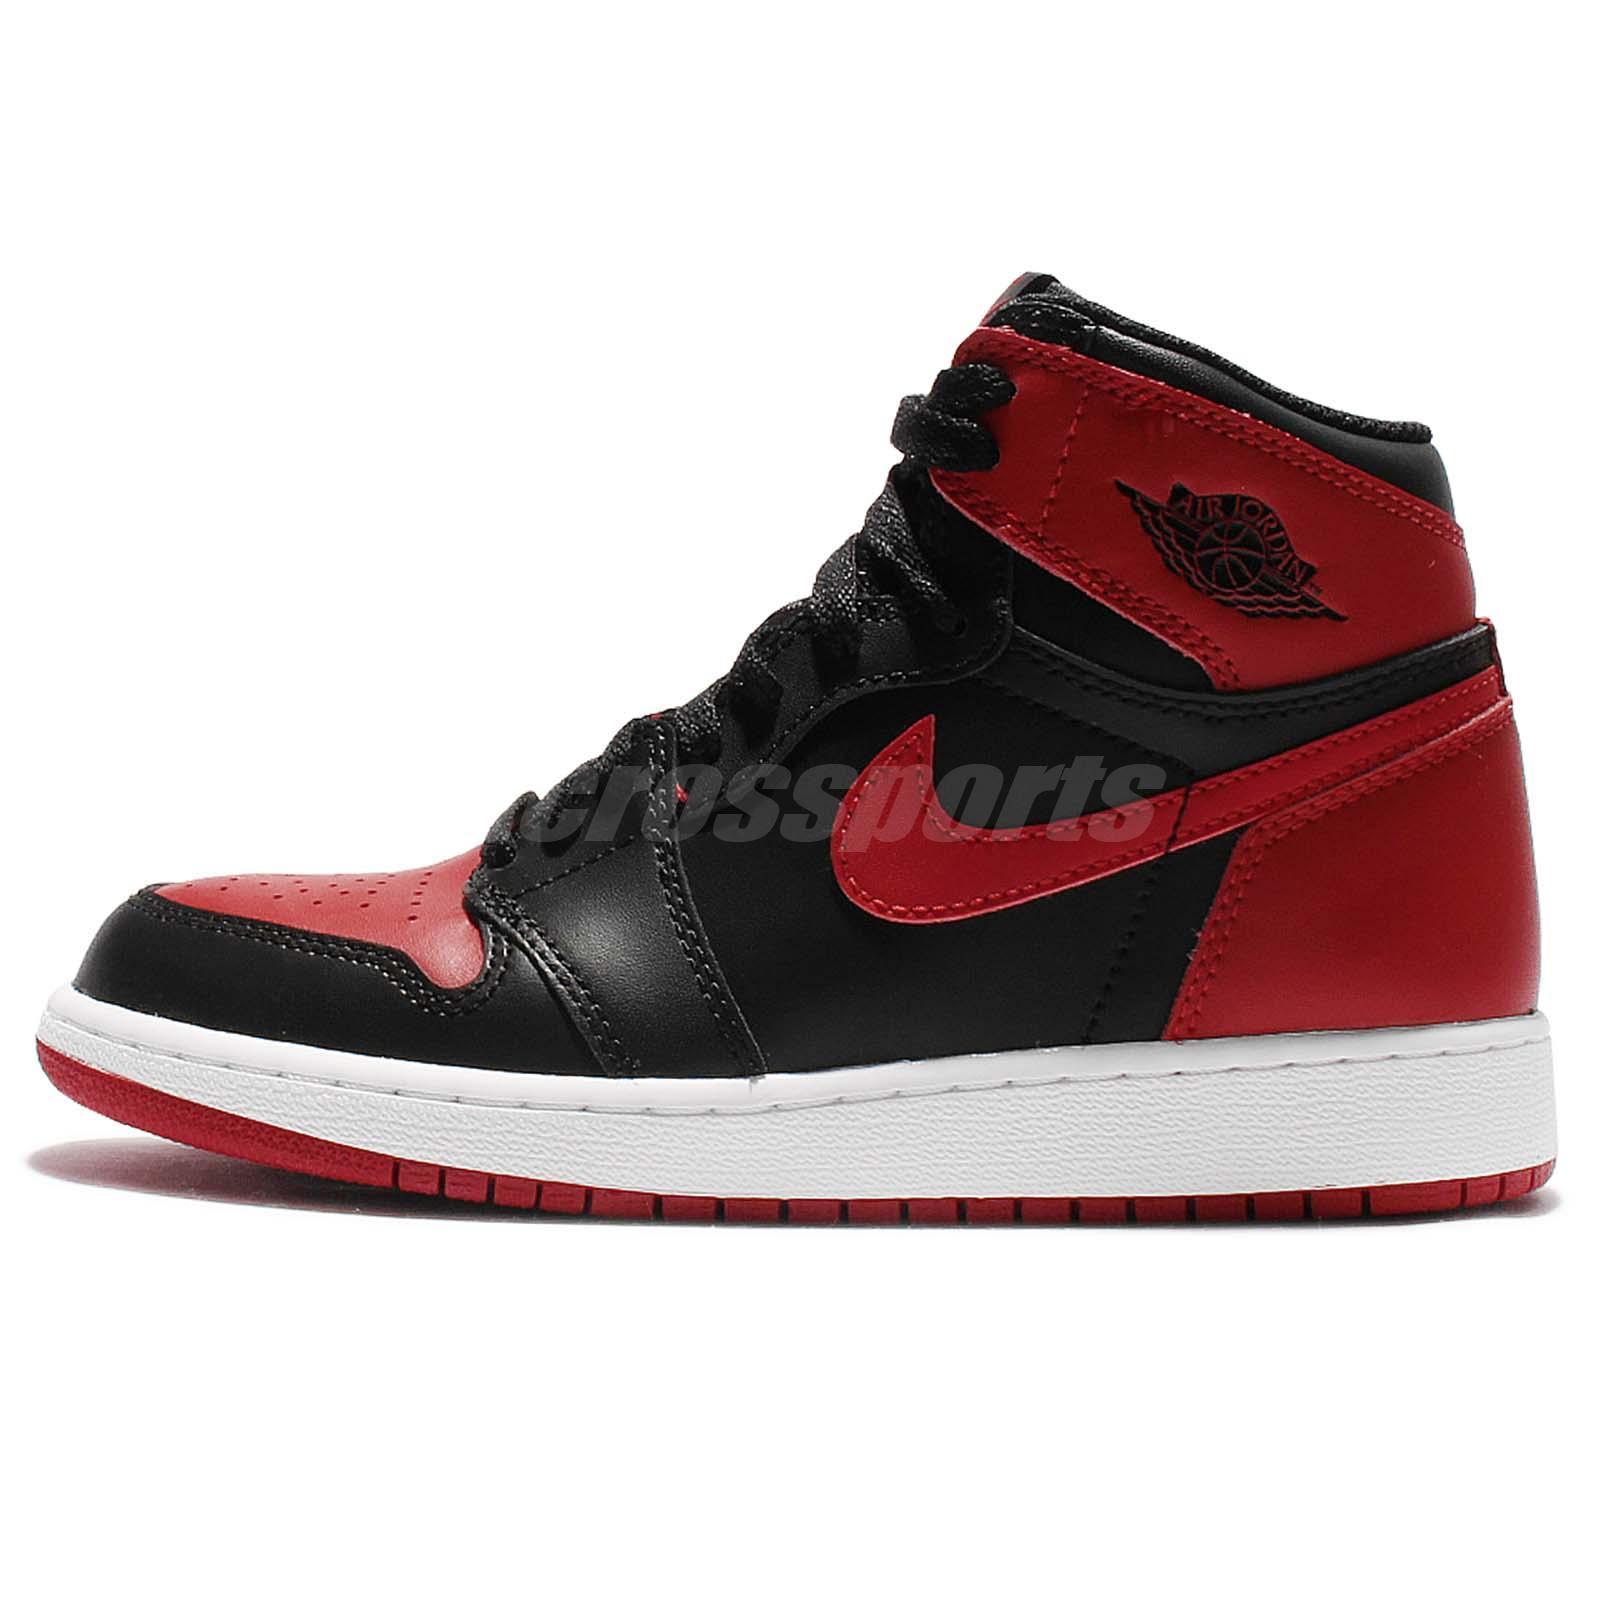 Nike Air Jordan Youth Basketball Shoes